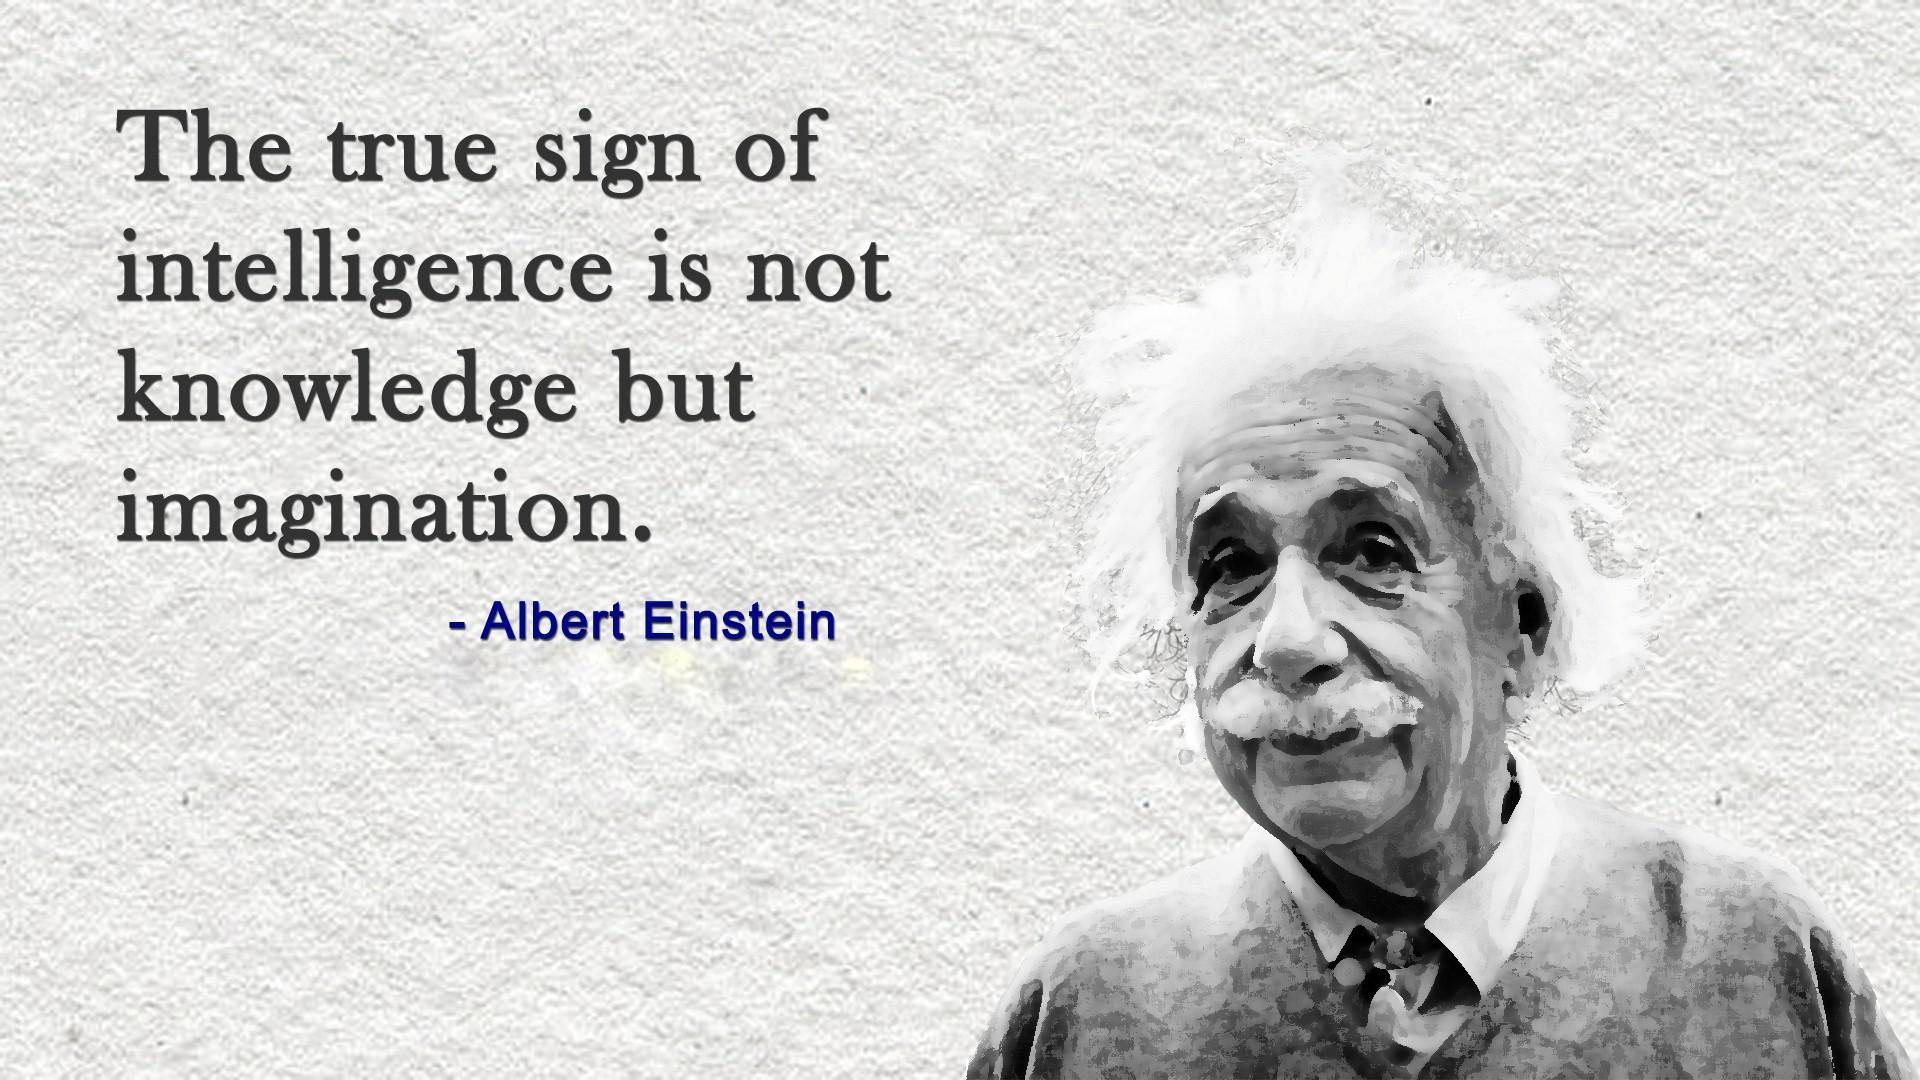 Inspirational Quotes Of Albert Einstein In Hindi - HD Wallpaper